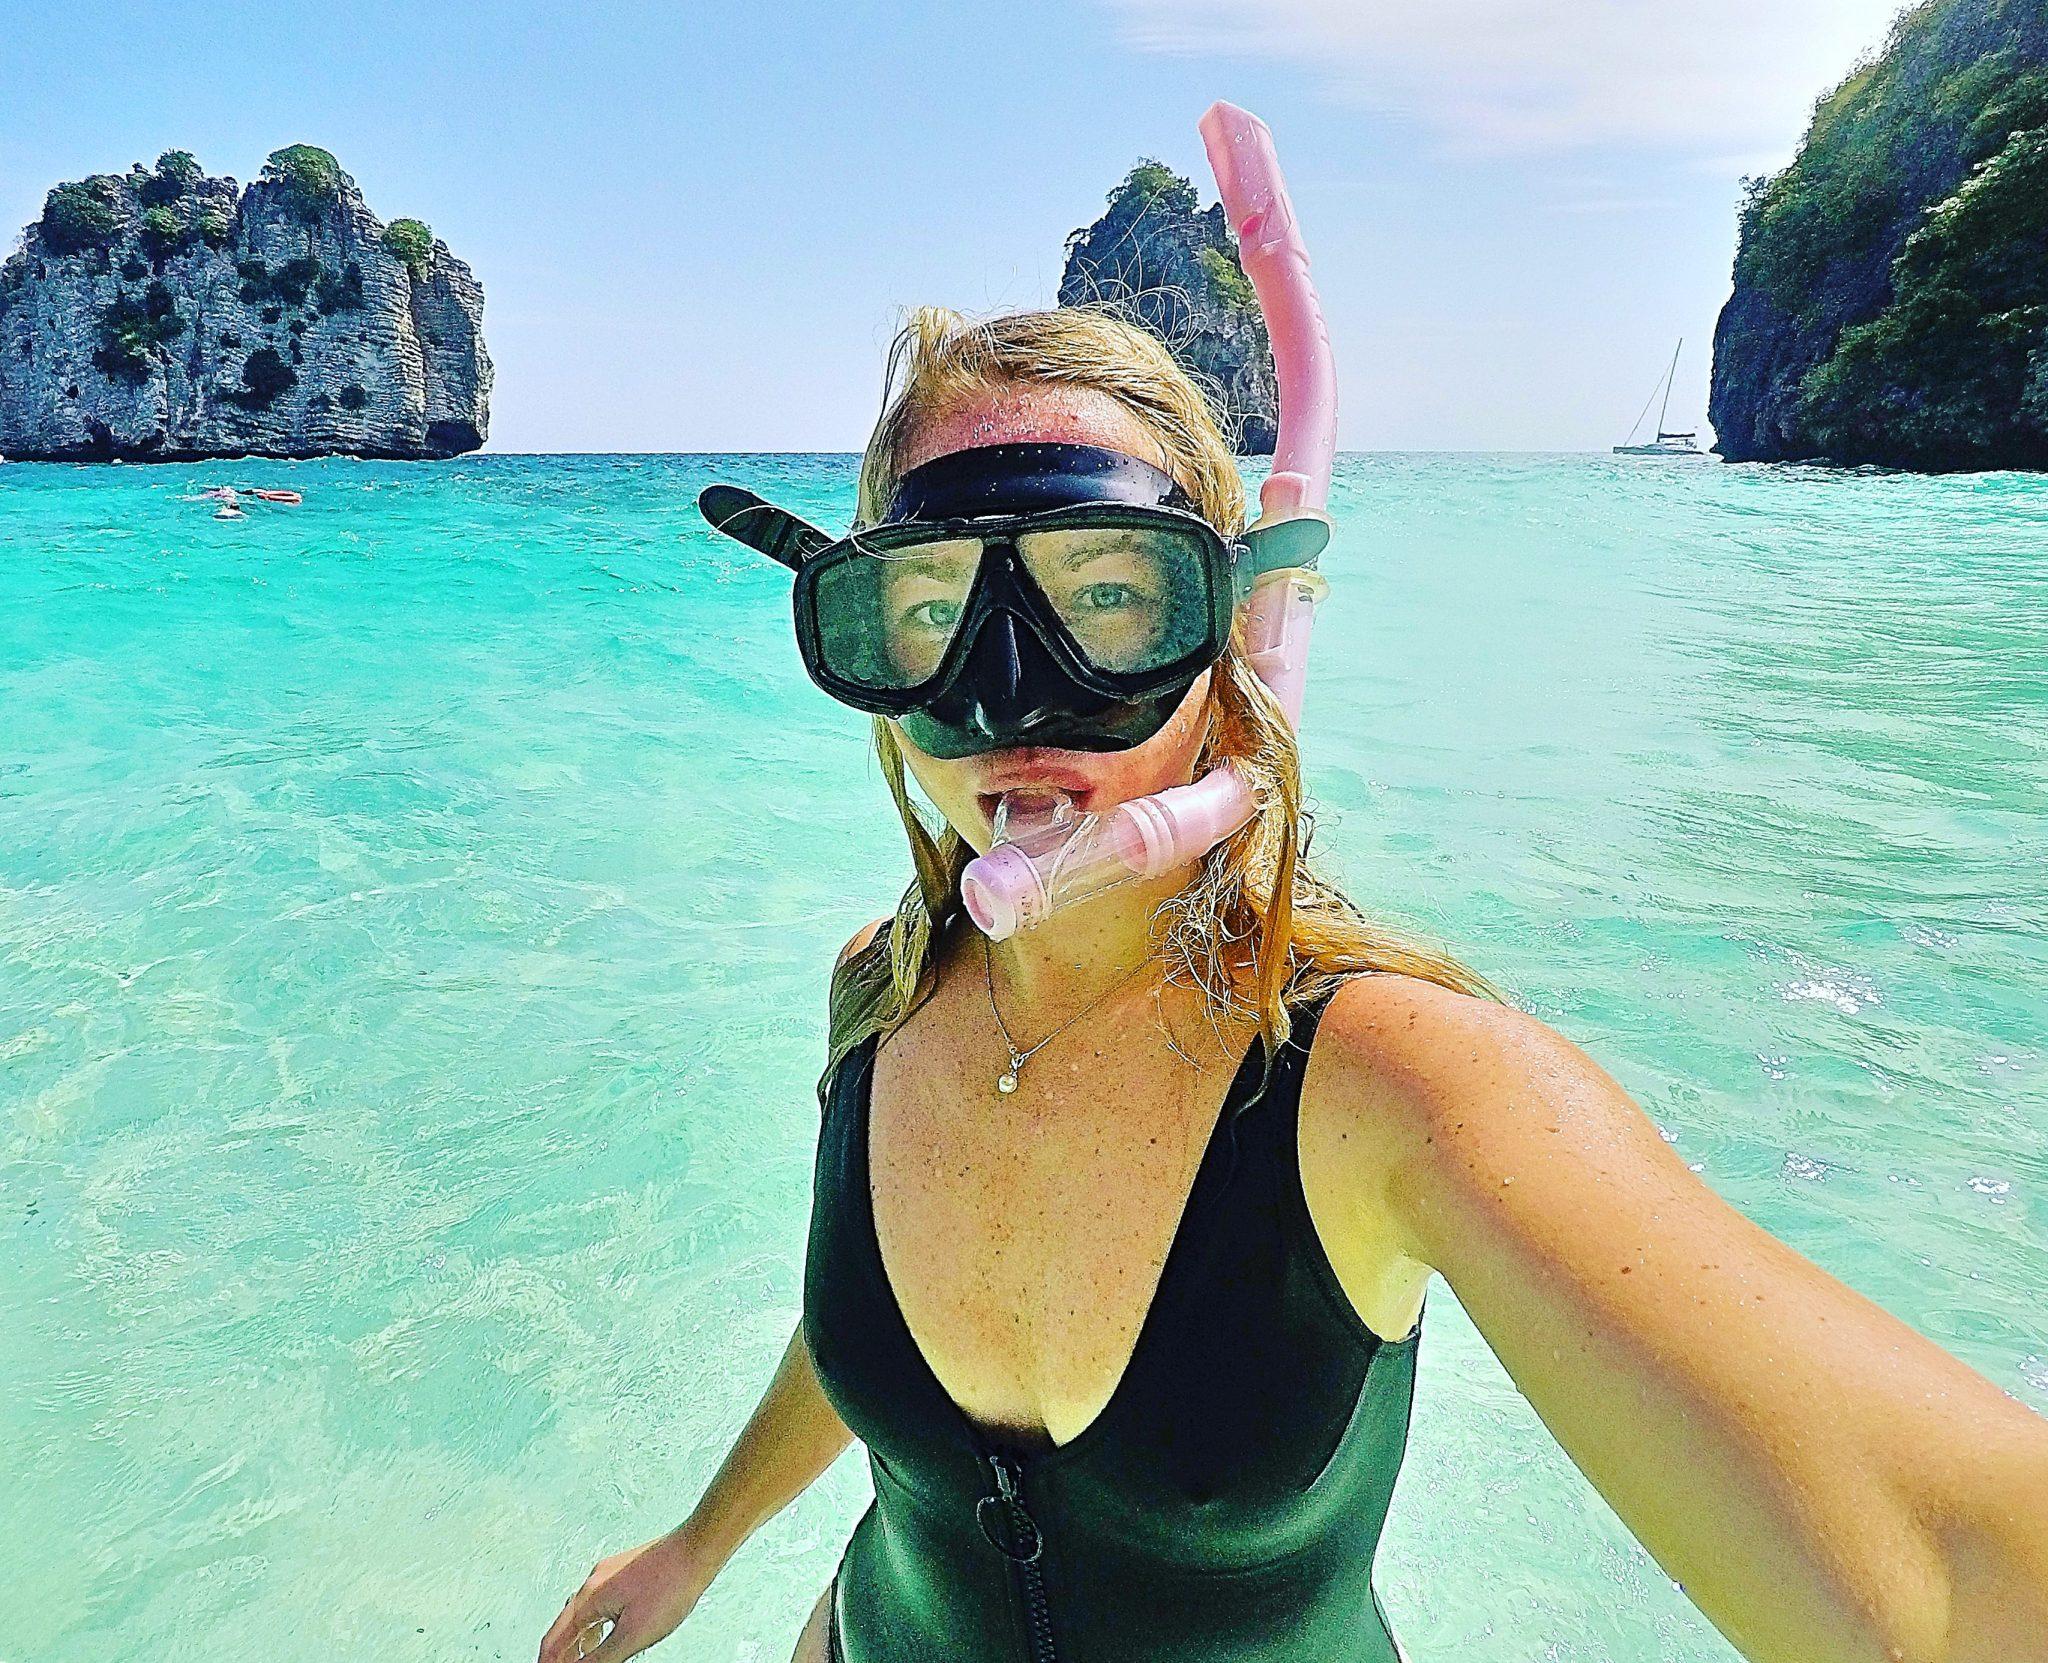 Snorkling i Thailand